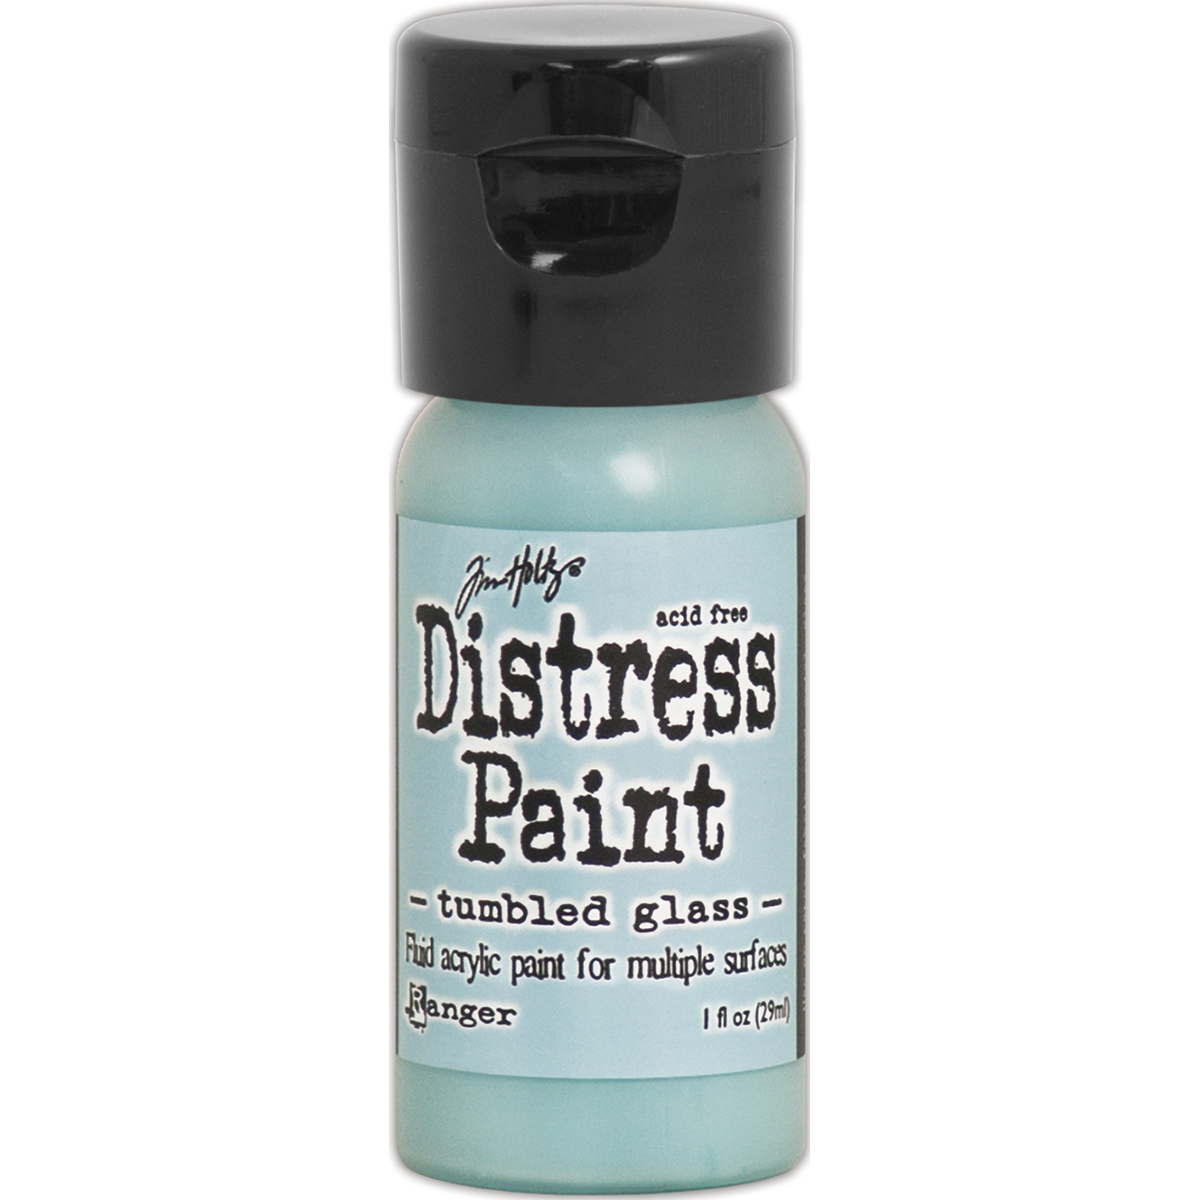 distress paint Tumbled Glass